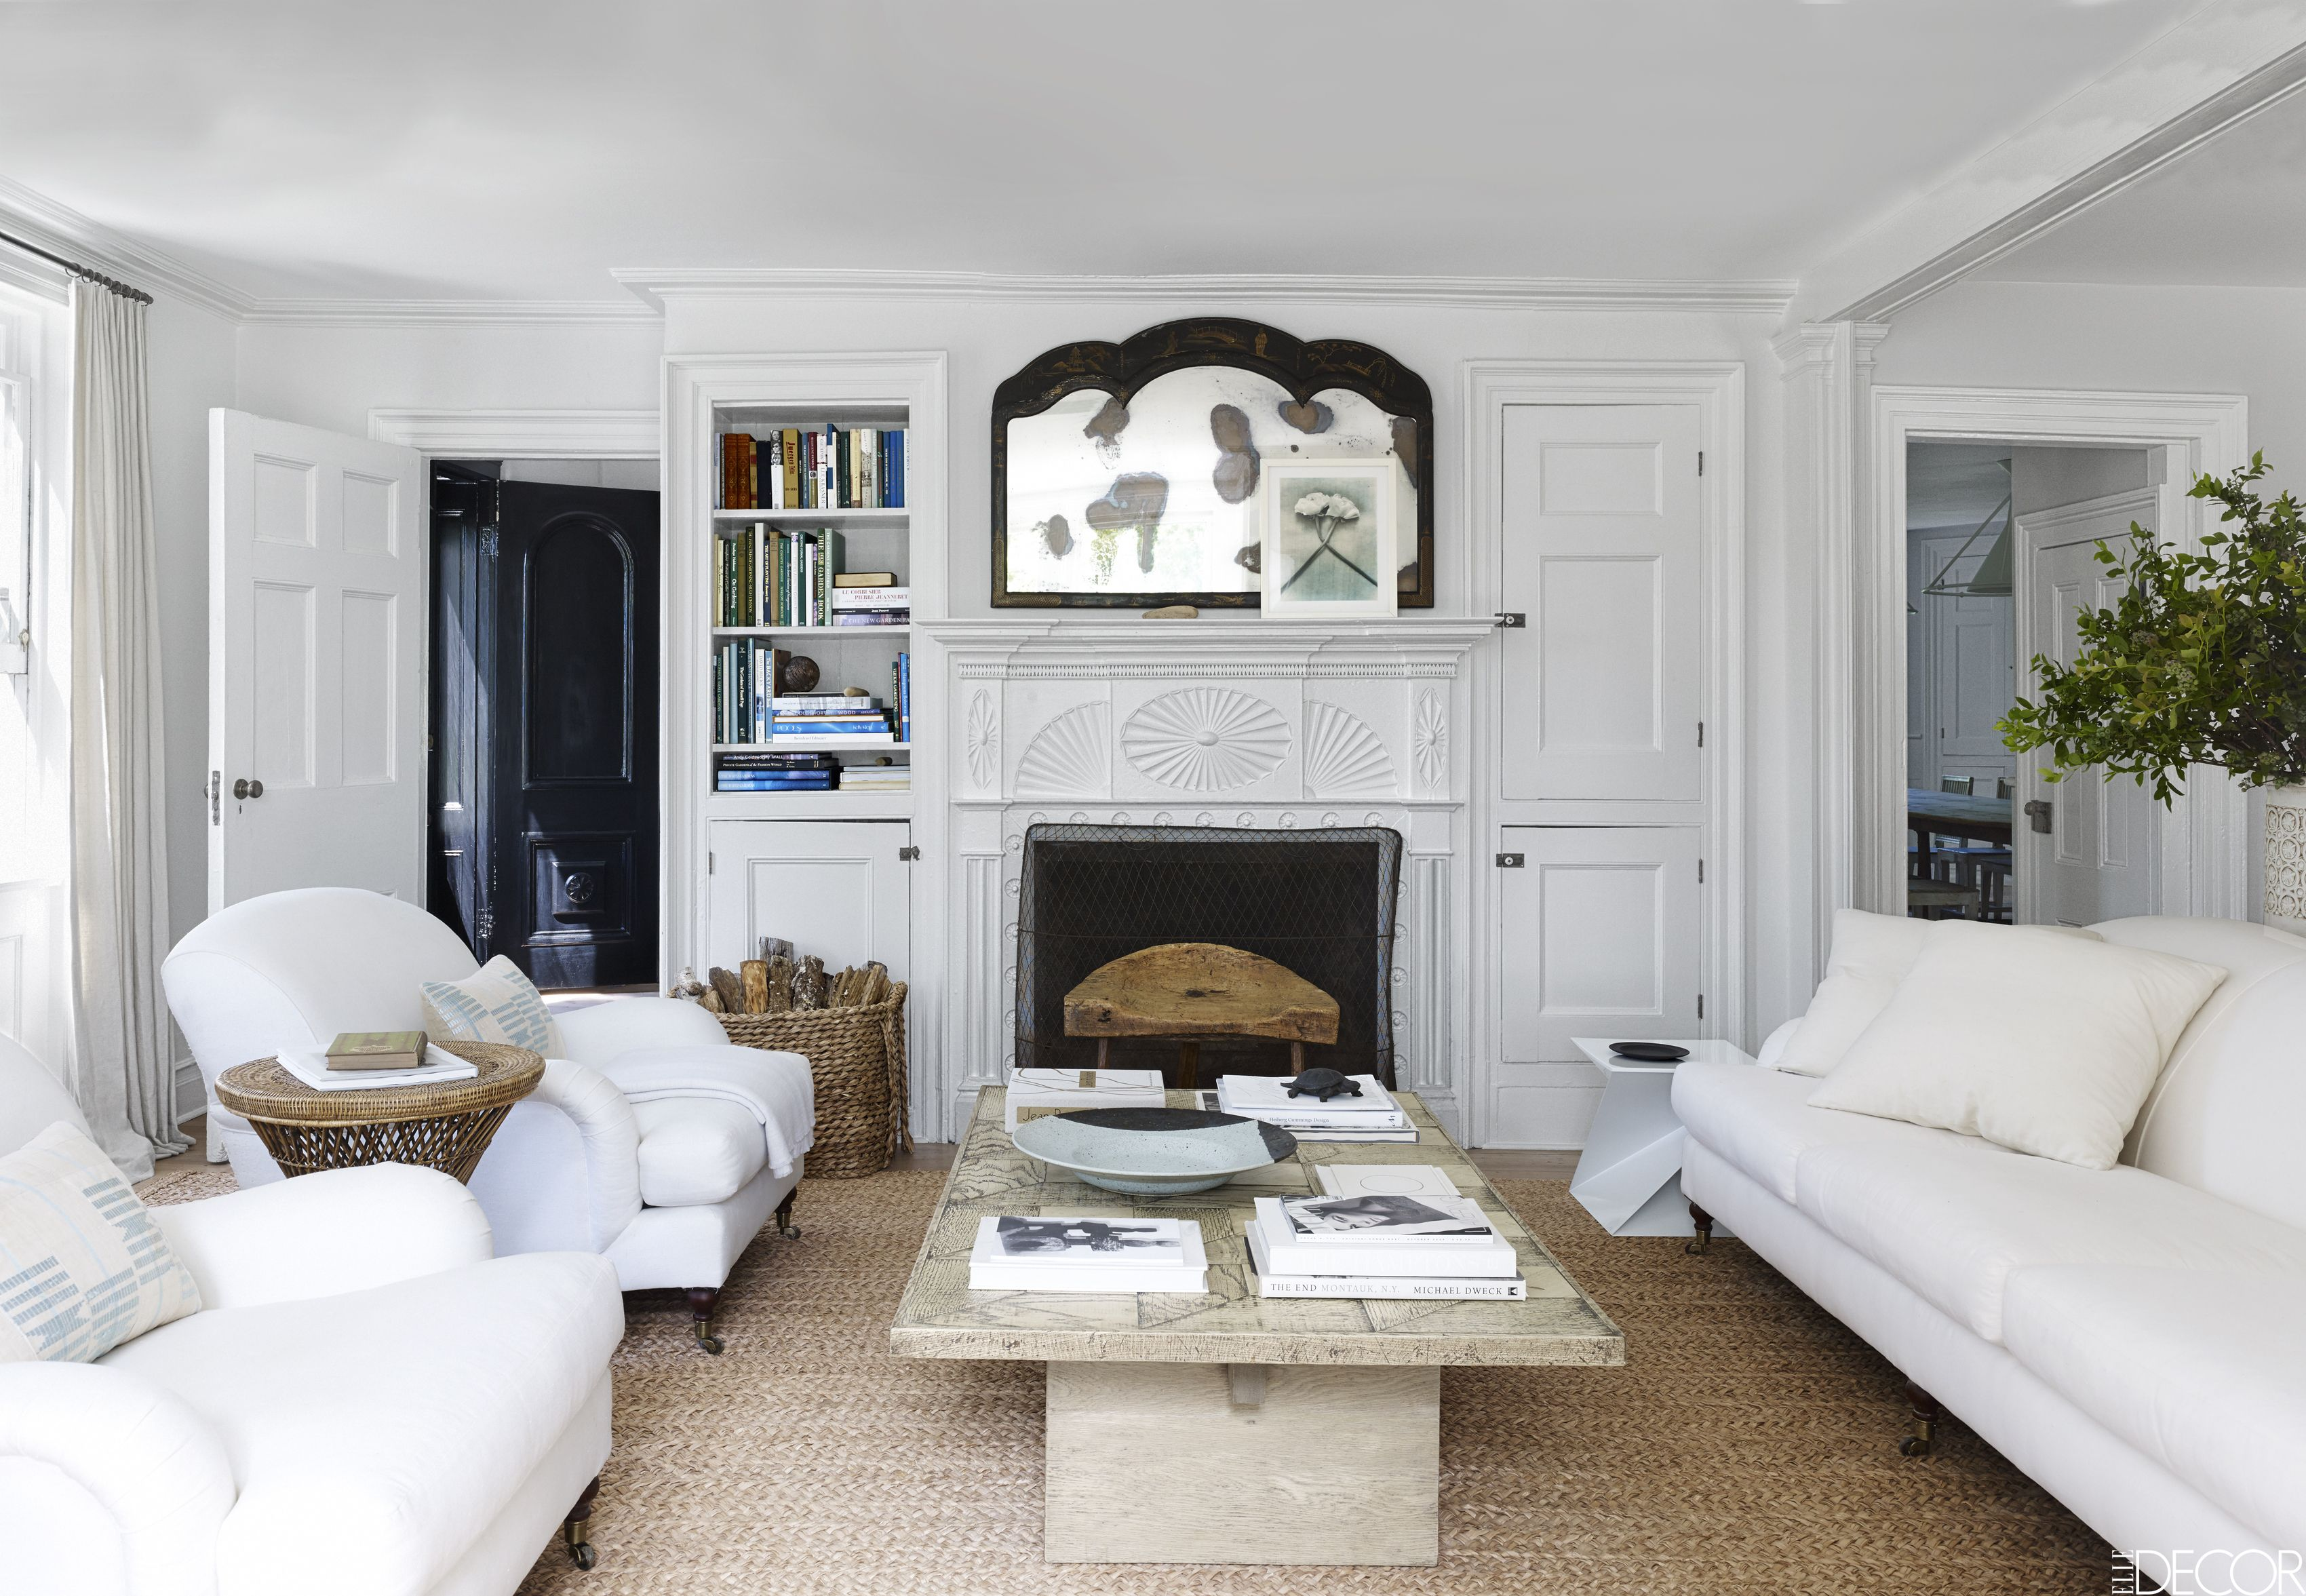 Ideas for living room furniture Small Image Elle Decor 24 Best White Sofa Ideas Living Room Decorating Ideas For White Sofas